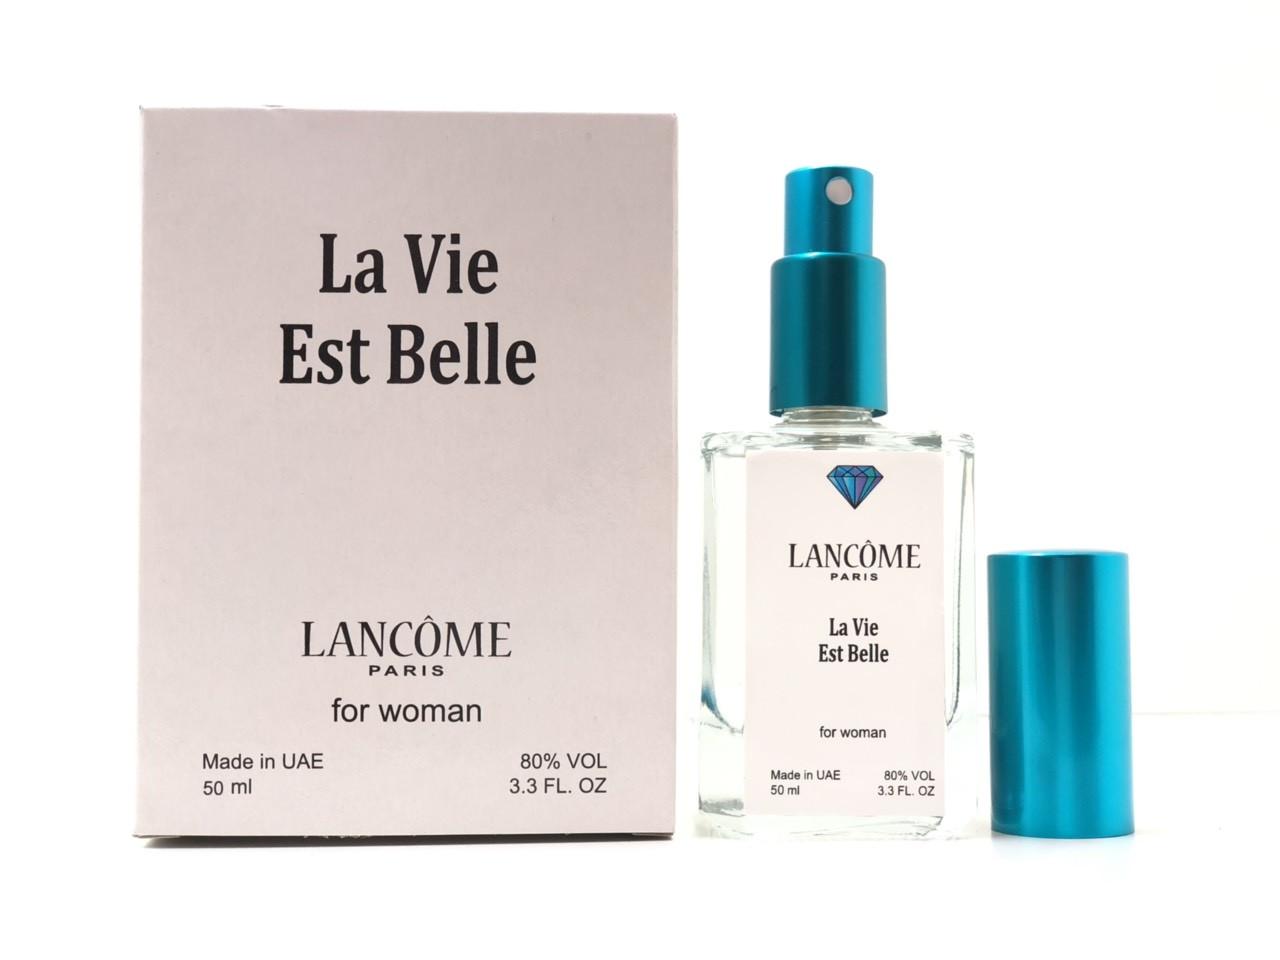 Парфюм Lancome La Vie Est Belle (Ланком Ля Ви Э Бель) 50 мл Diamond - реплика